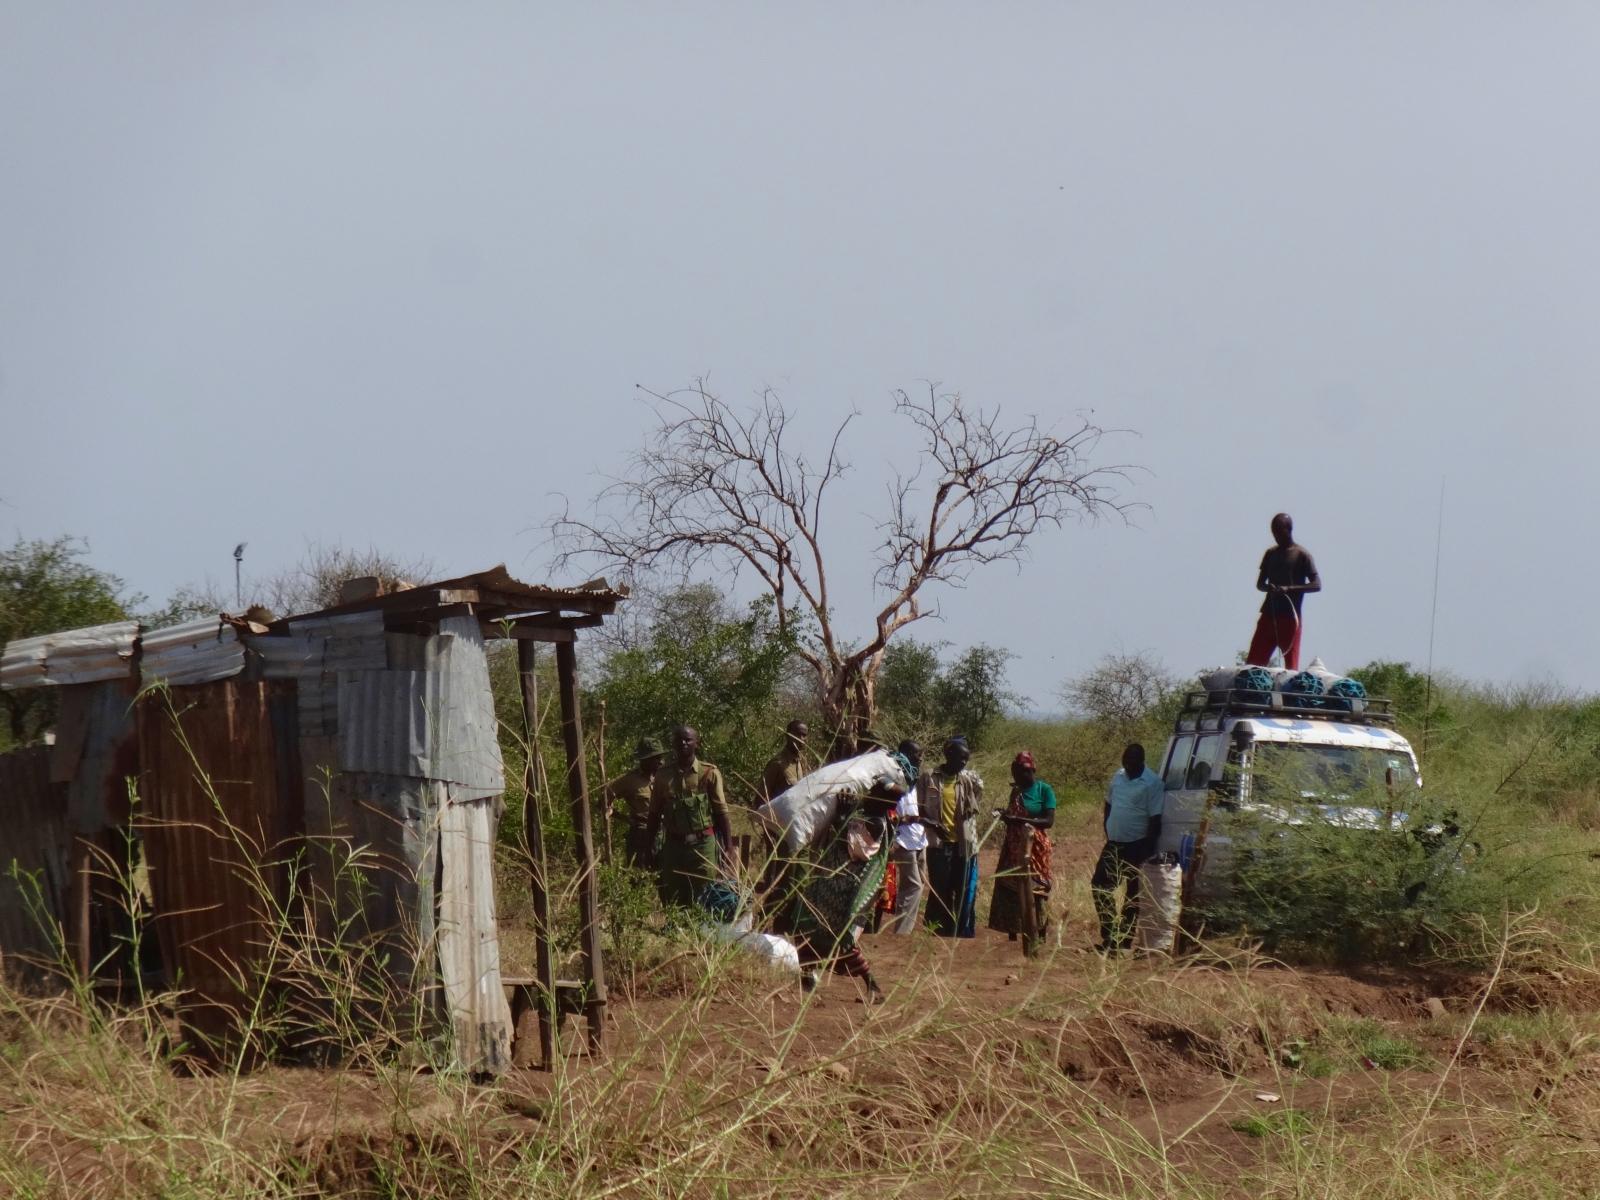 South Sudanese crossing the border into Kenya